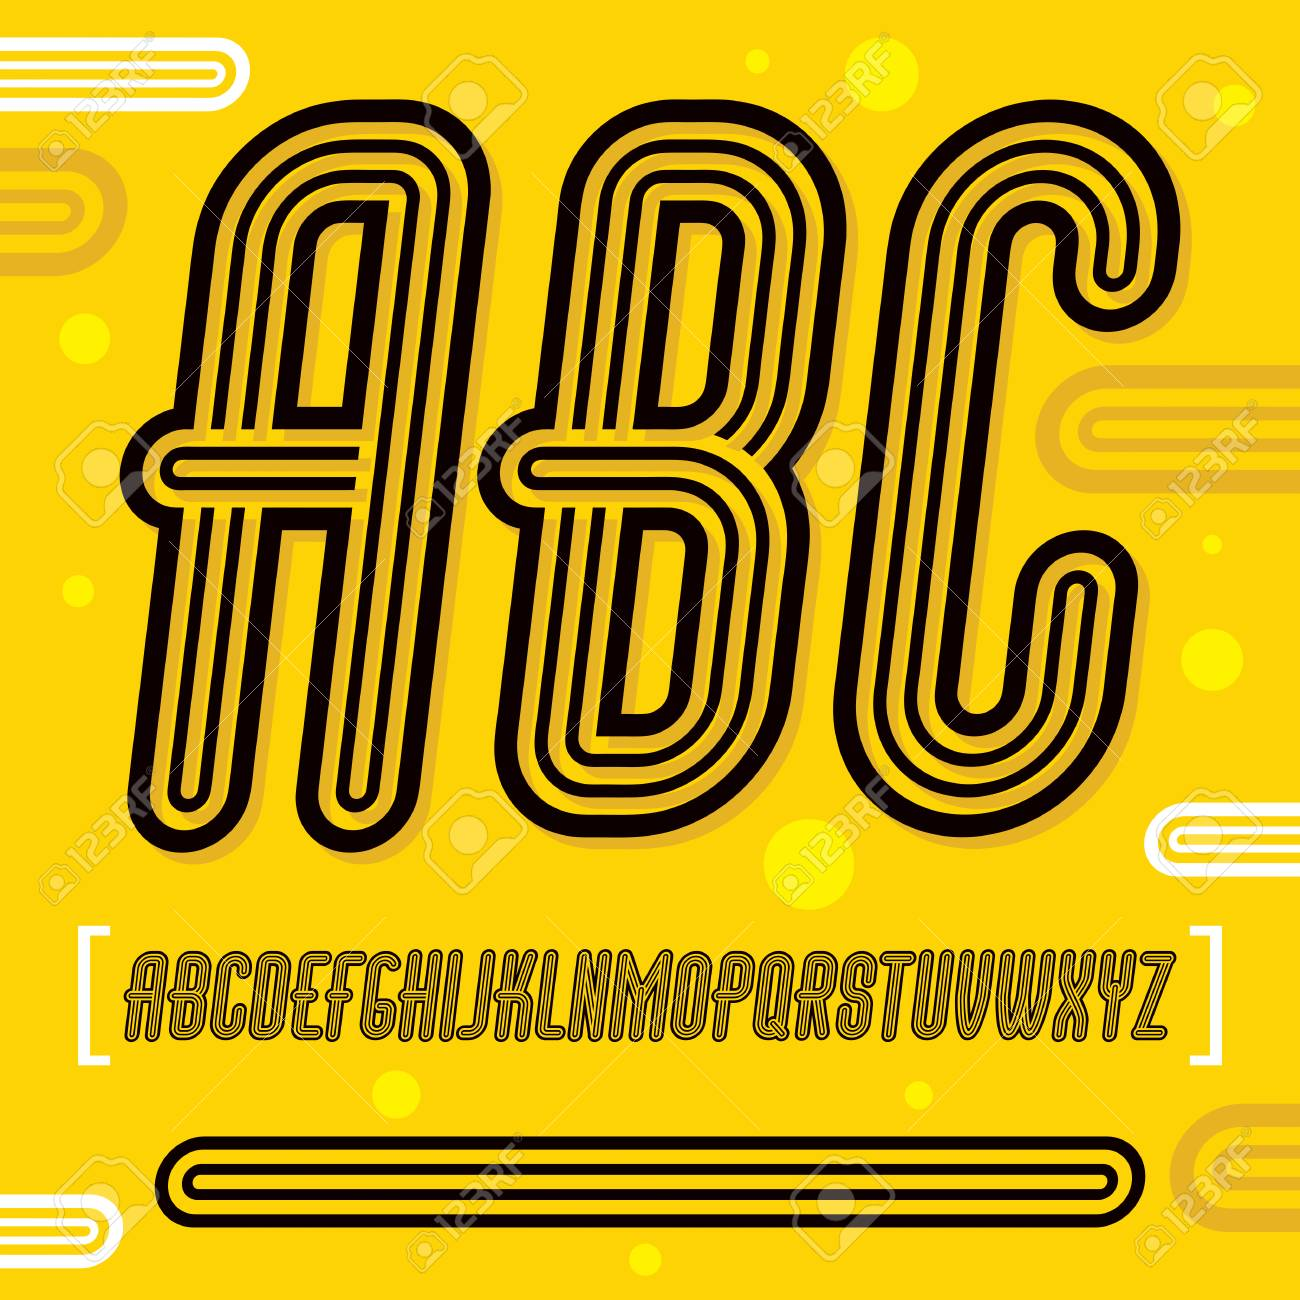 Abc Creation à vector trendy retro uppercase alphabet letters, abc collection